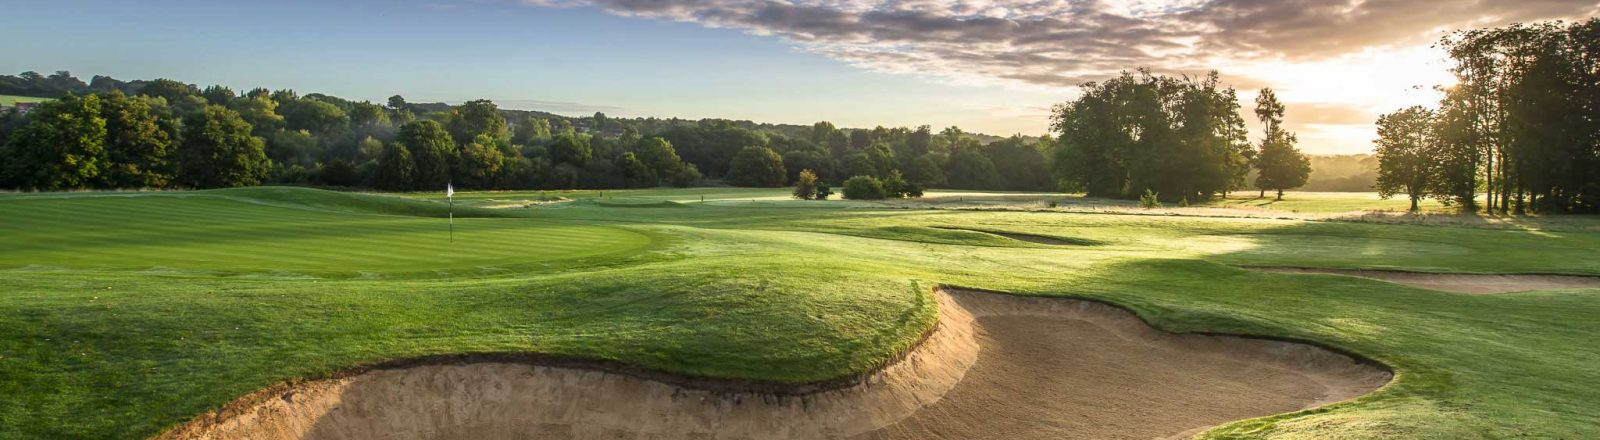 Aldwickbury Park Golf Course at sunset